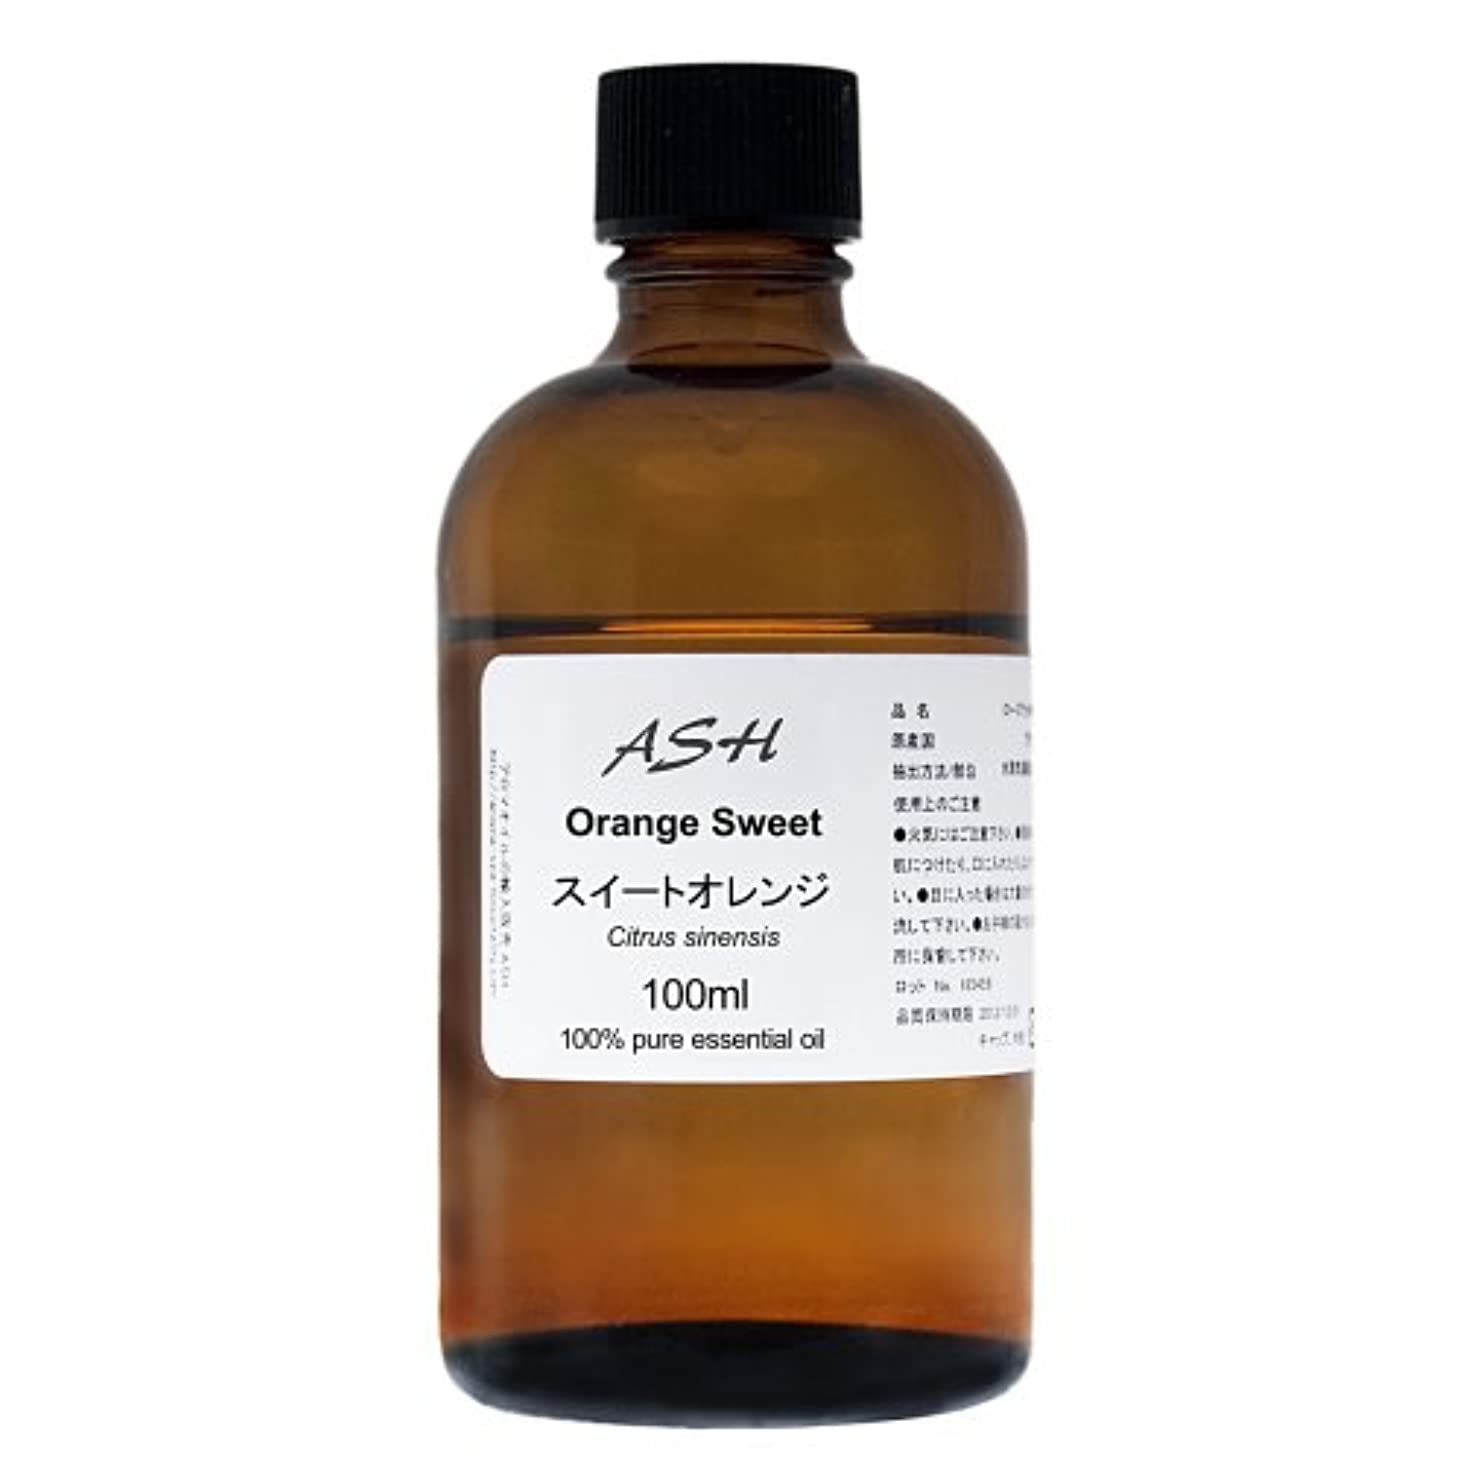 ASH スイートオレンジ エッセンシャルオイル 100ml AEAJ表示基準適合認定精油